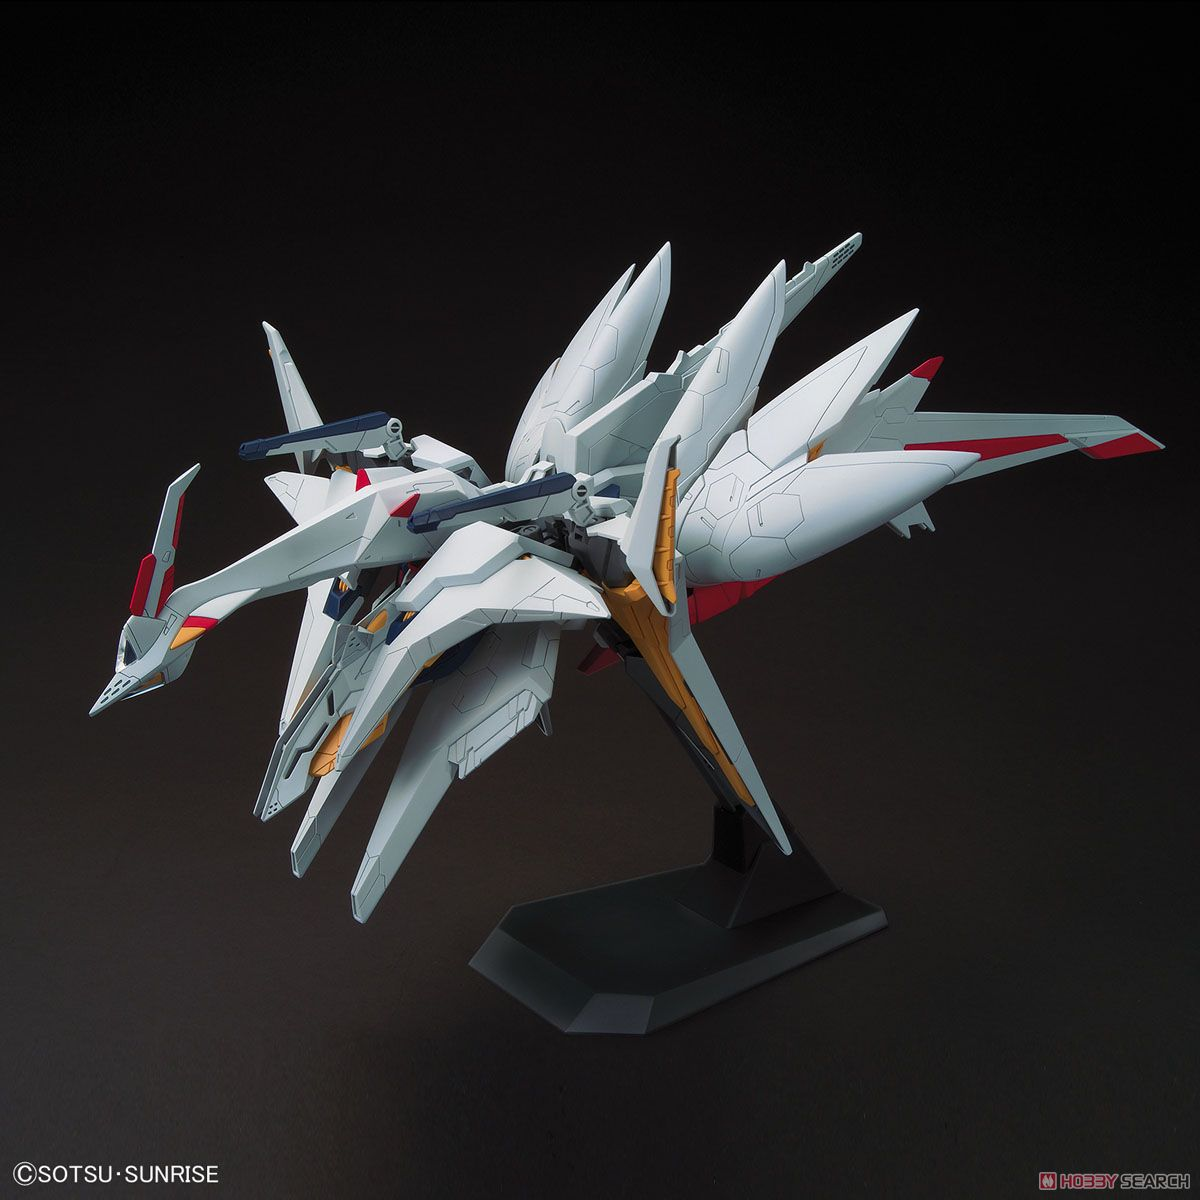 HGUC 1/144『ペーネロペー』機動戦士ガンダム 閃光のハサウェイ プラモデル-008